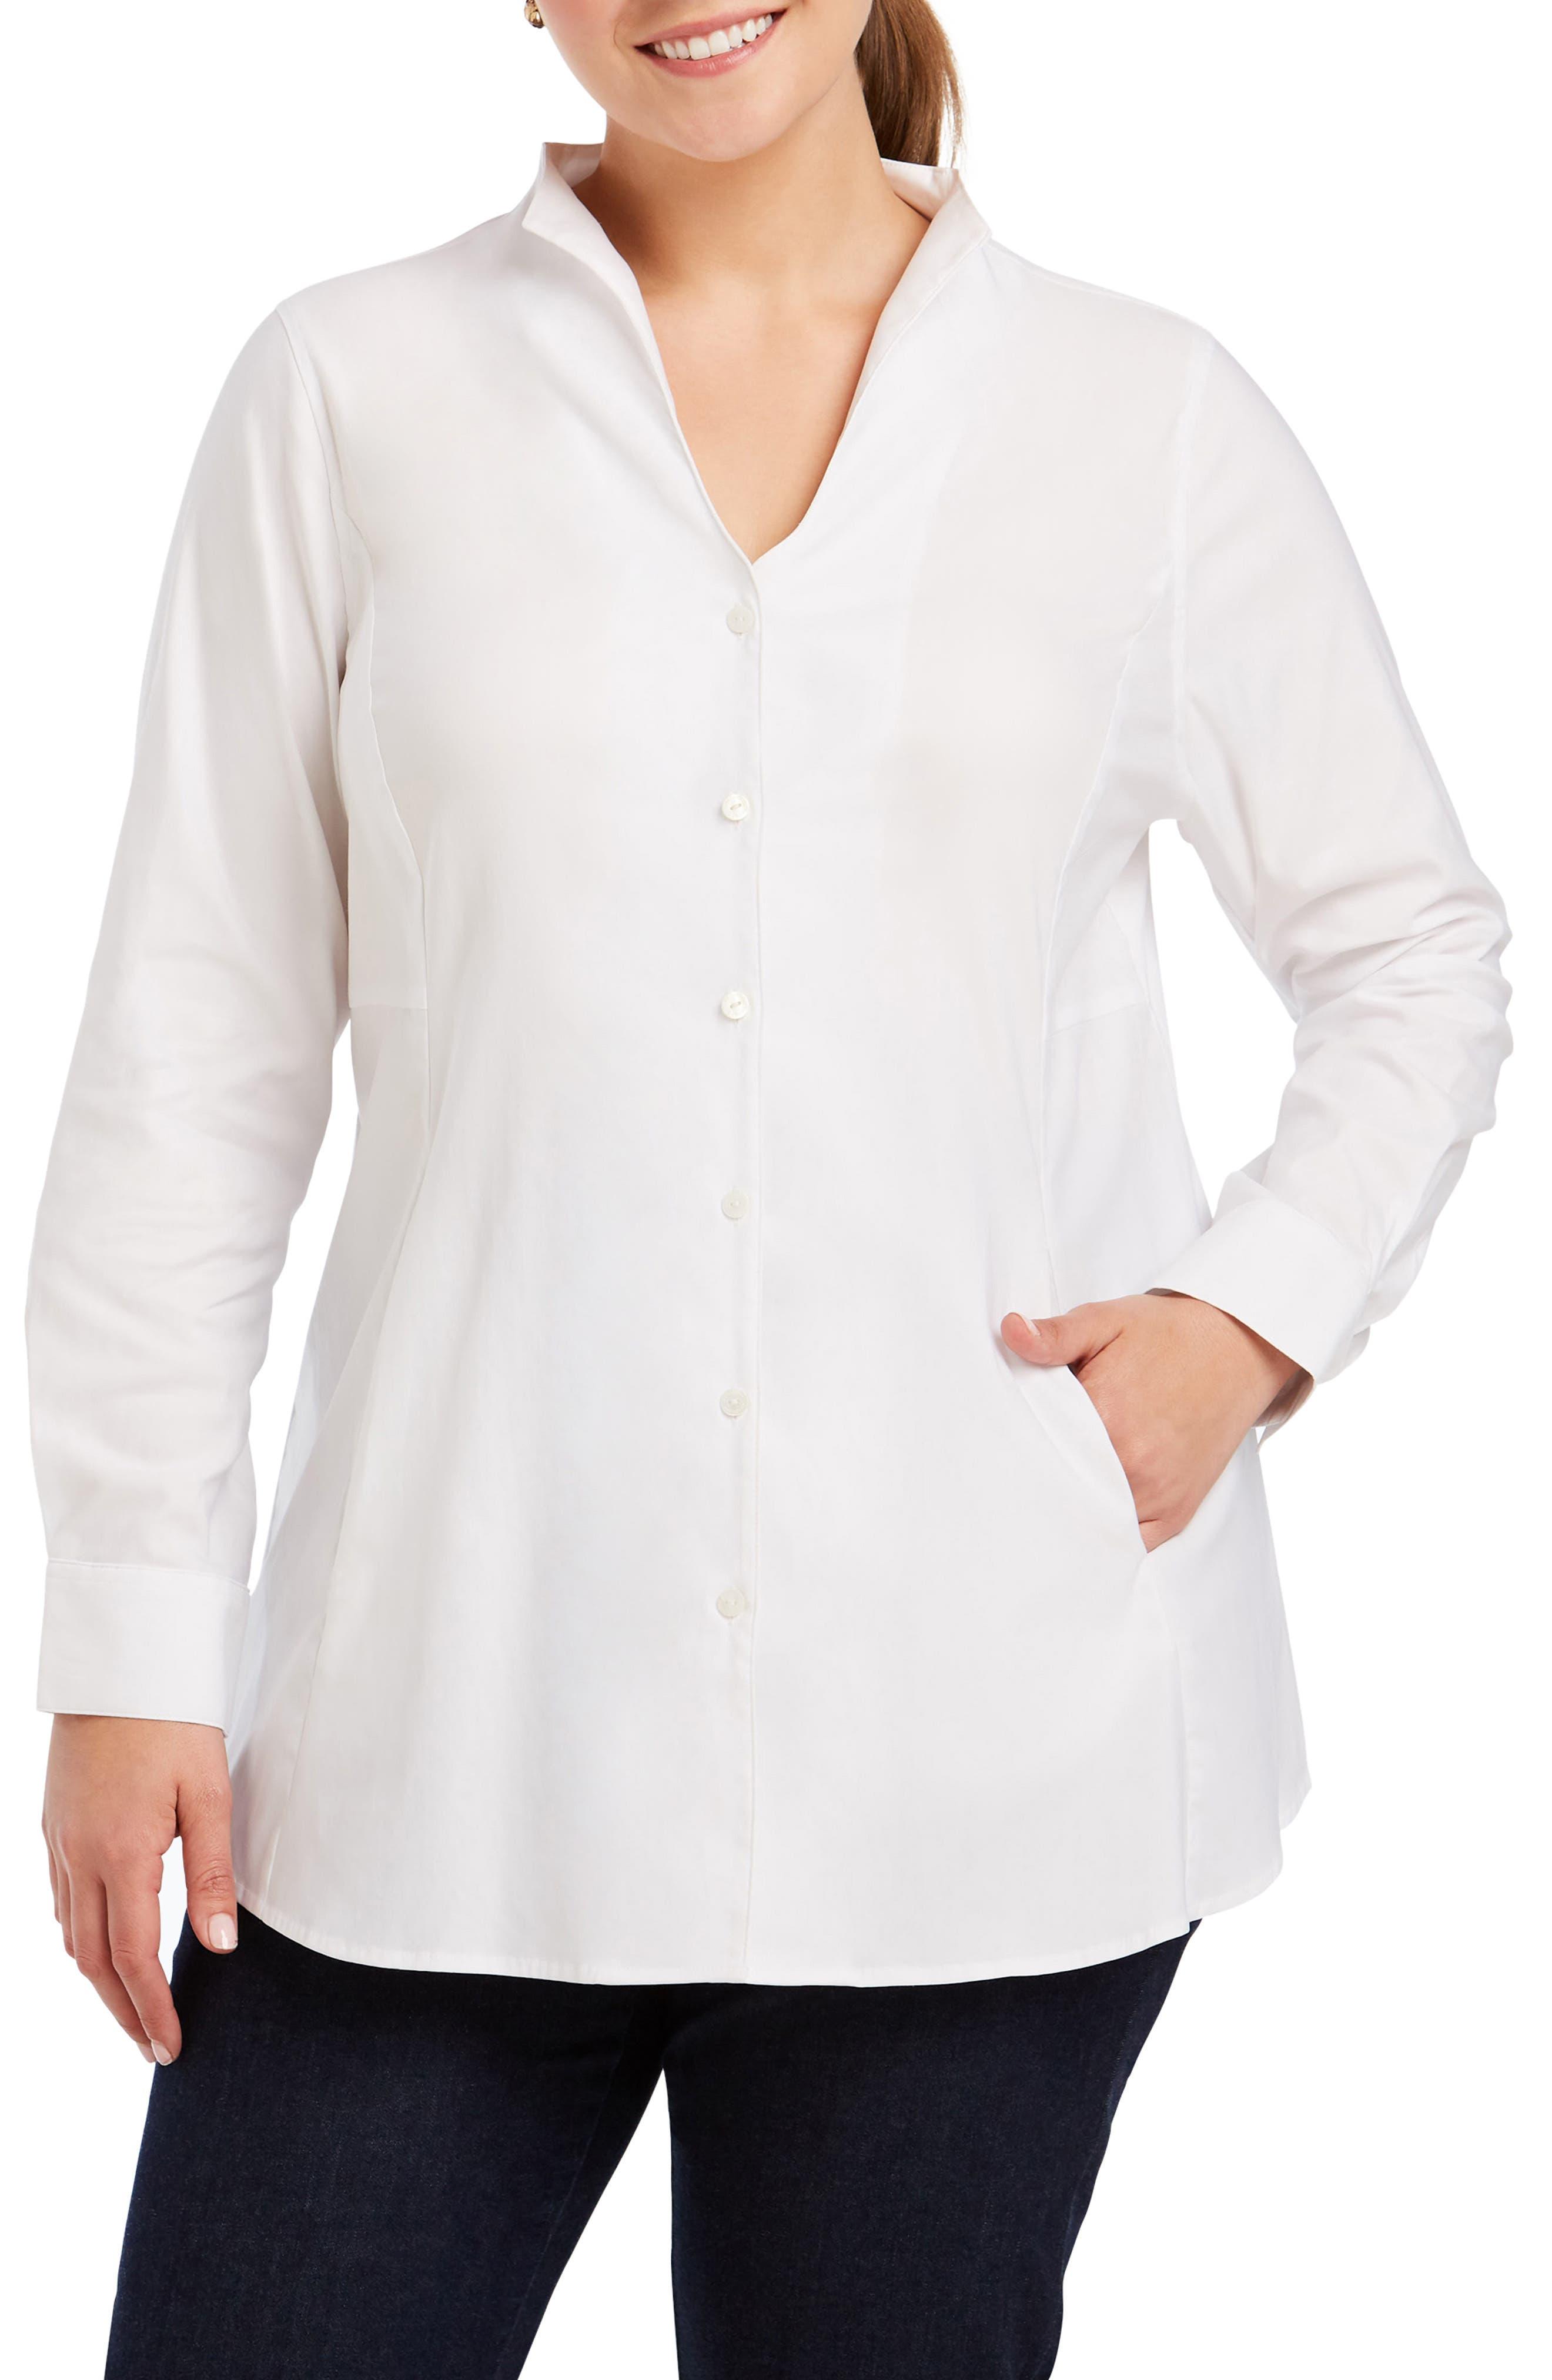 Selma Stretch Tunic Shirt,                             Main thumbnail 1, color,                             WHITE